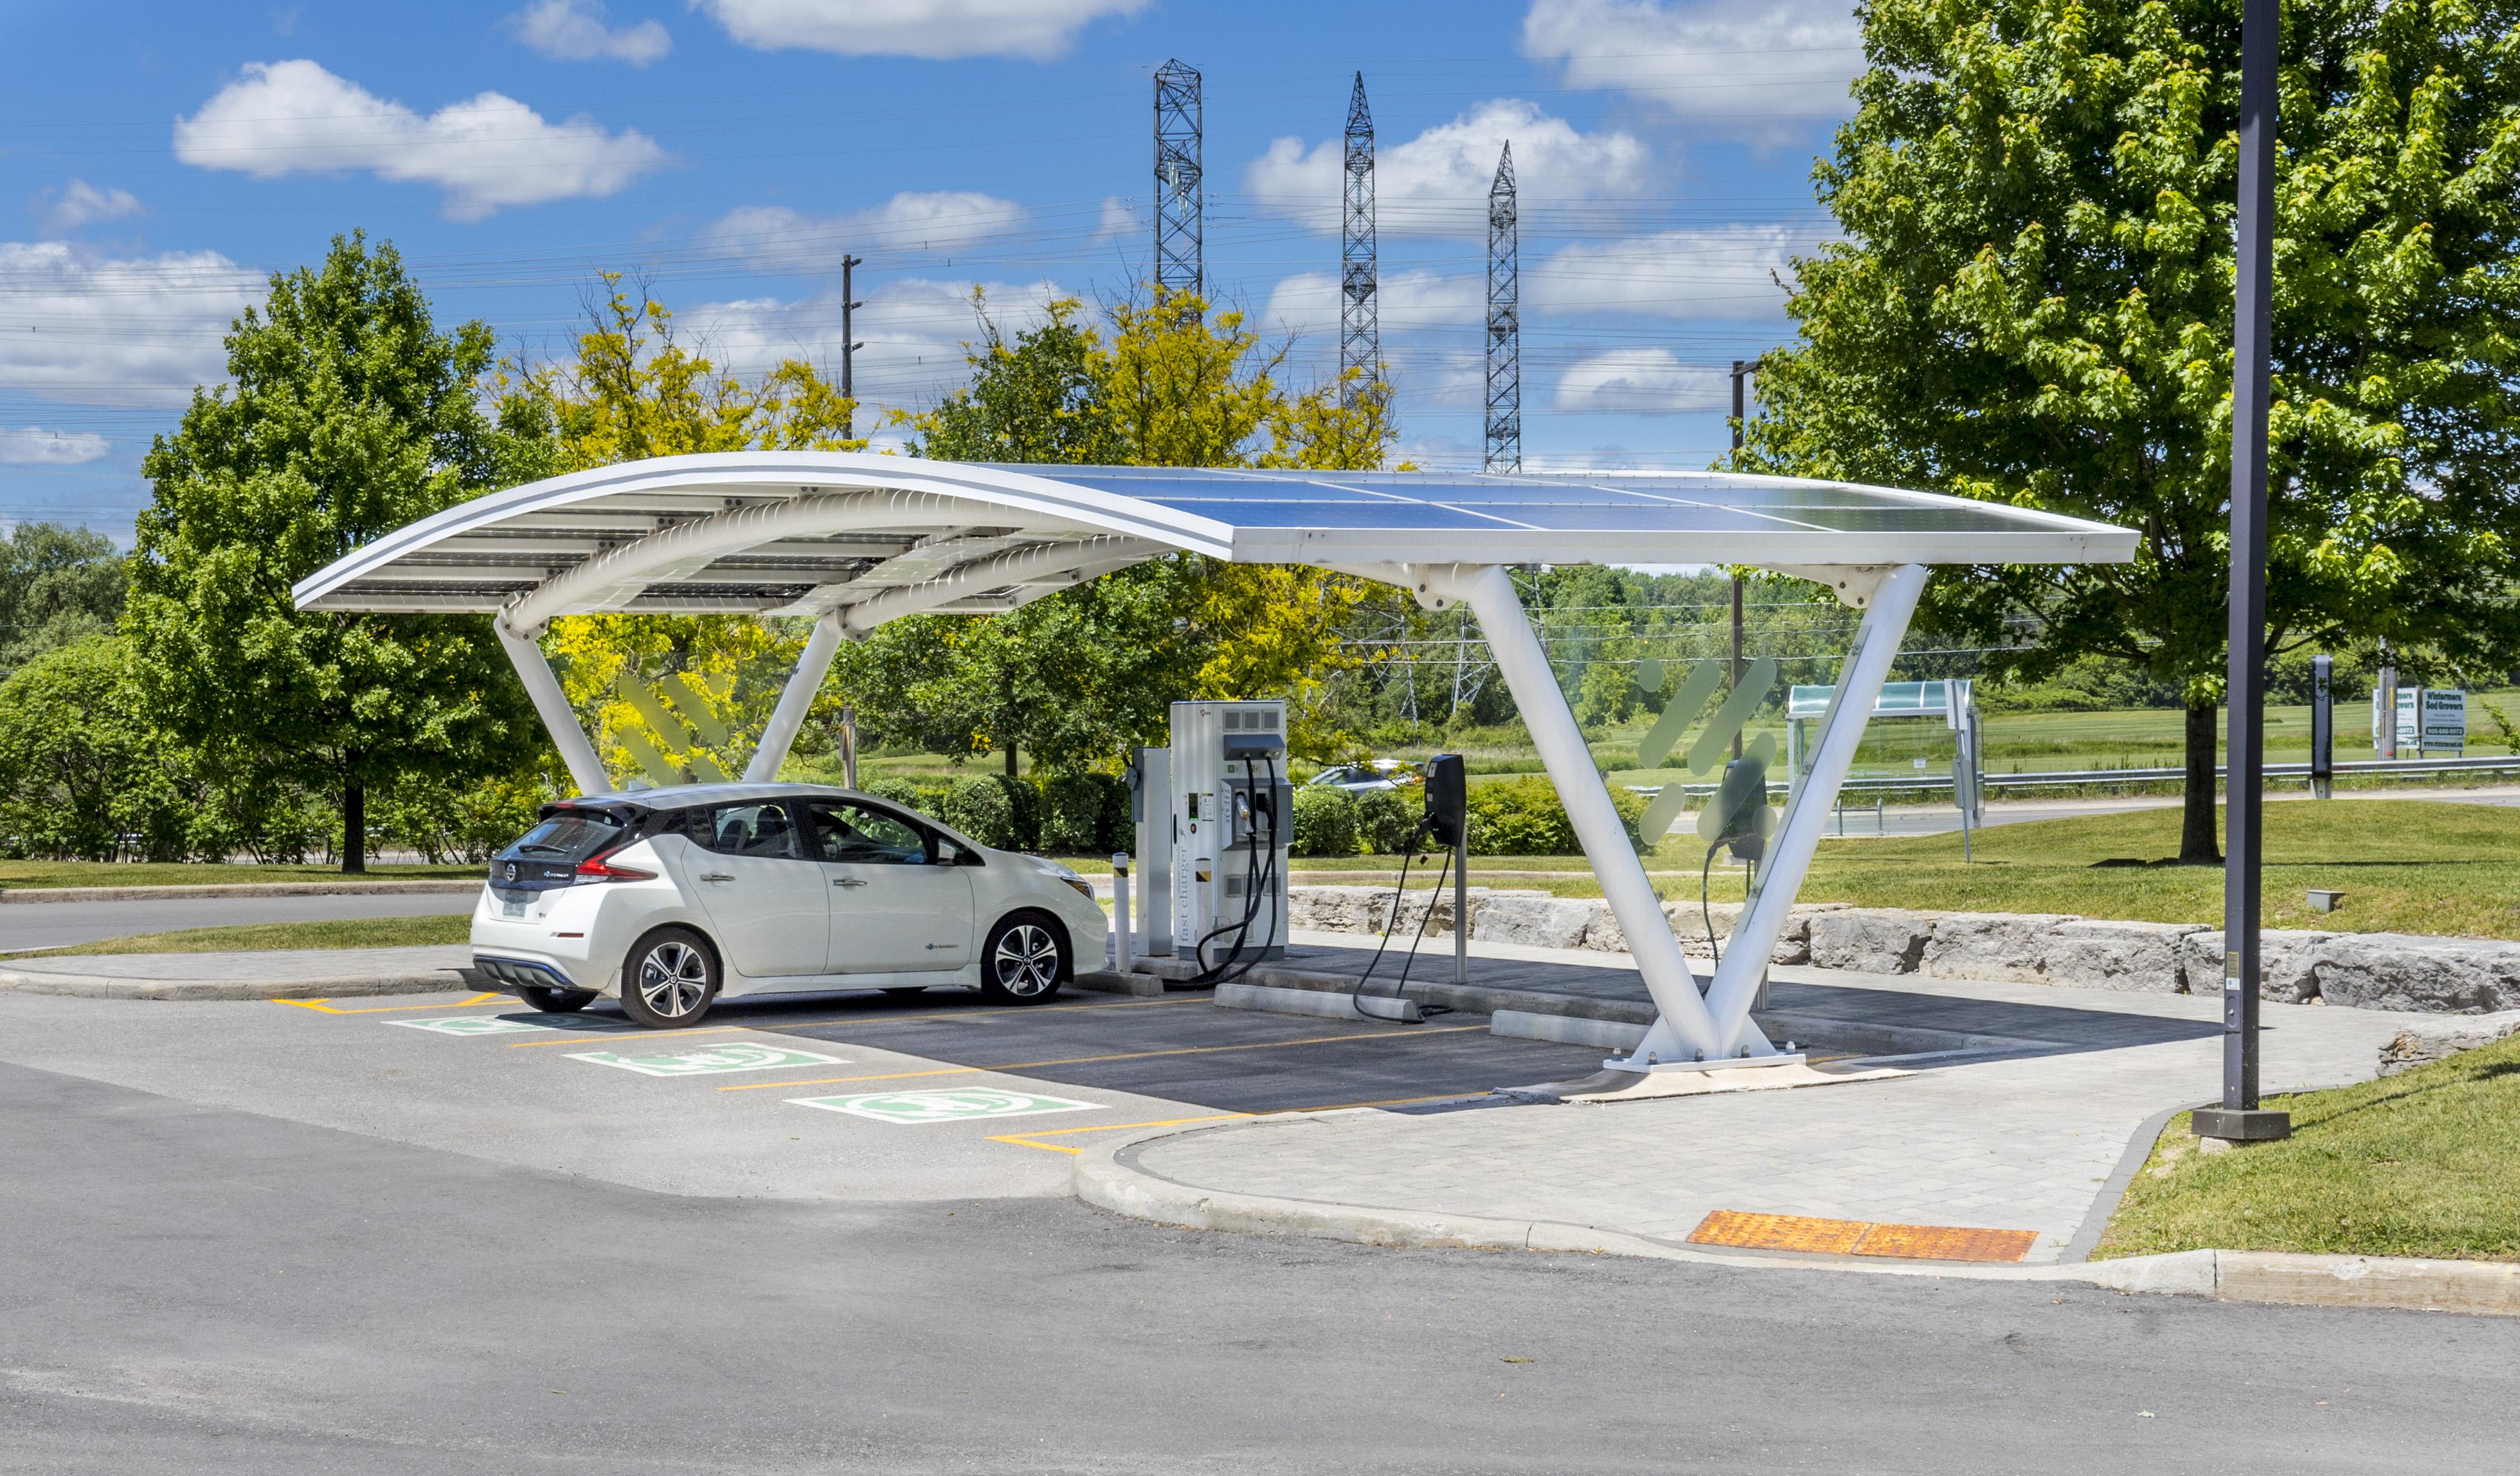 HQ Solar Powered Carport 1